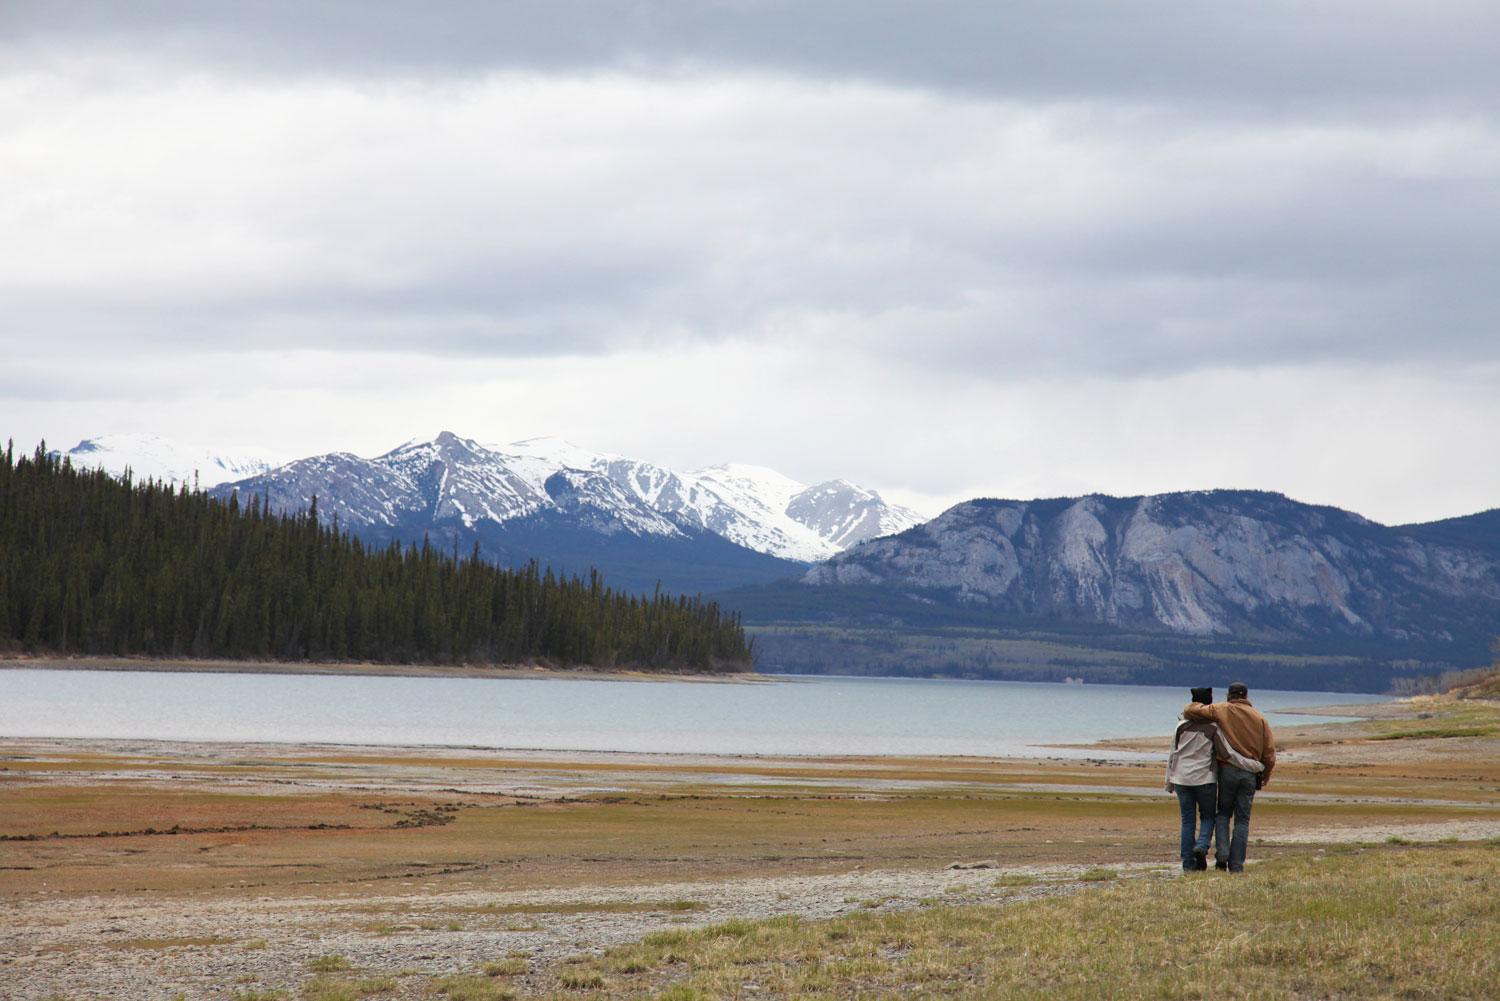 Tagish Lake in the Yukon, Canada.